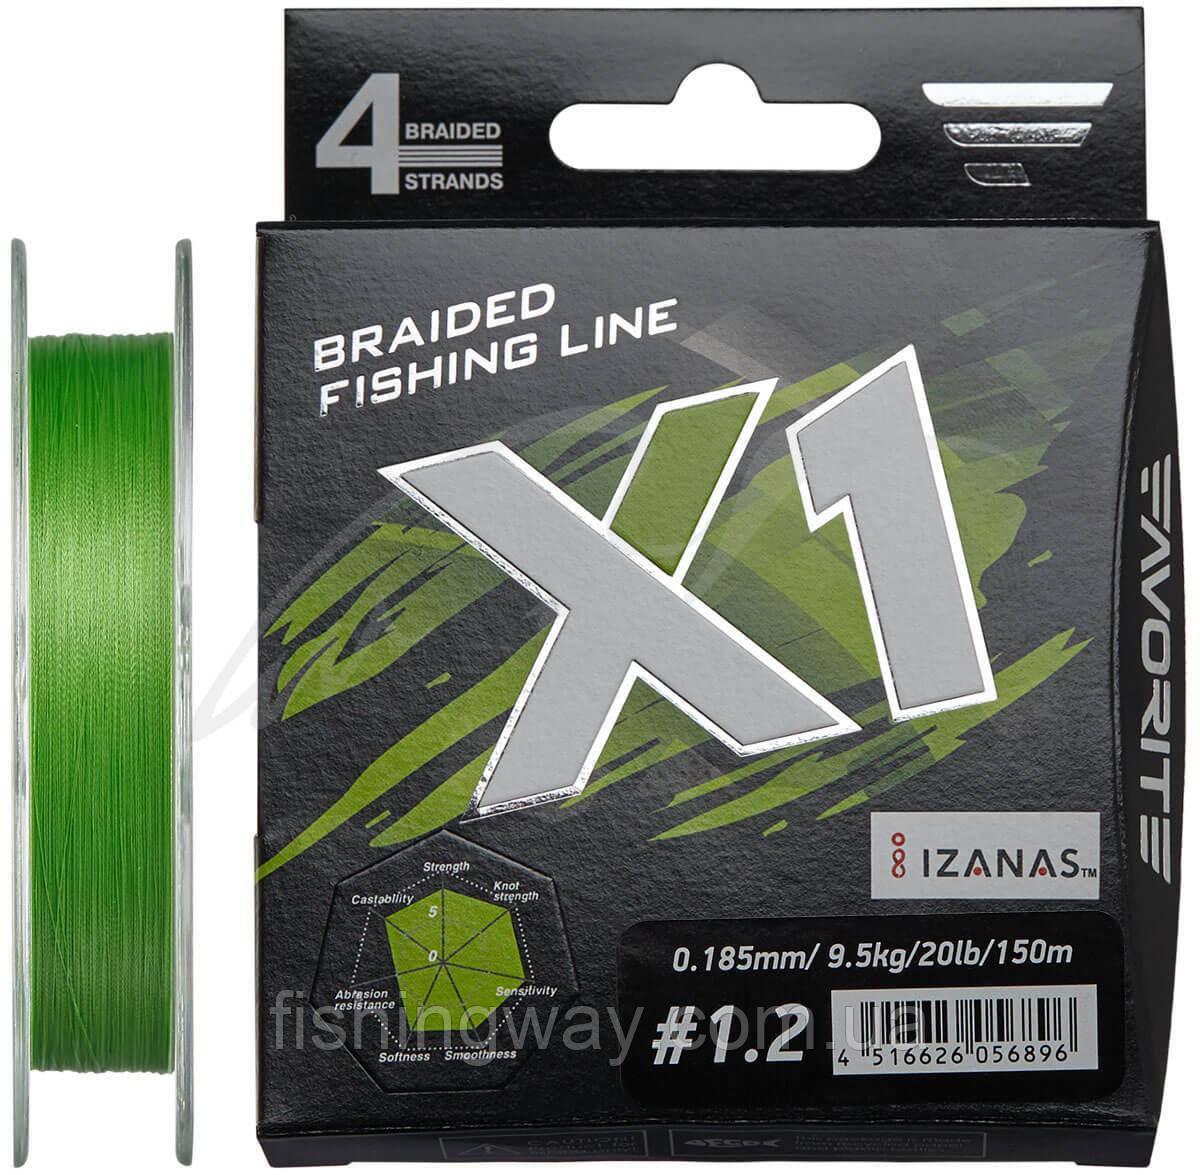 Шнур Favorite X1 PE 4x 150m (l.green) #1.2/0.185 mm 20lb/9.5 kg